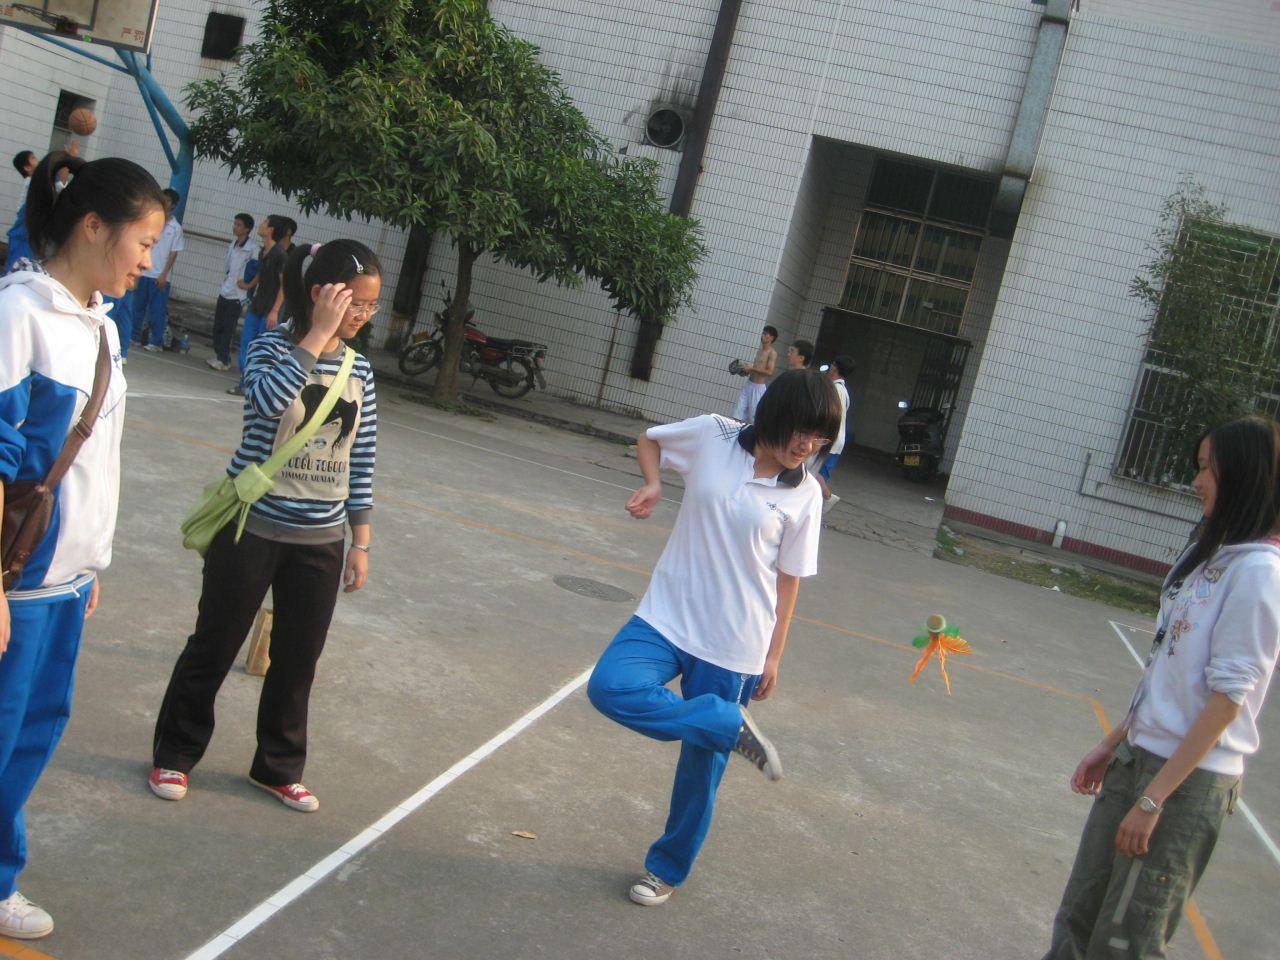 http://imgsrc.baidu.com/forum/pic/item/738b4710b912c8fcd9c16c86fc039245d688214e.jpg_茂名市一中校服是啥样的?真图!!!!!!!!_百度知道